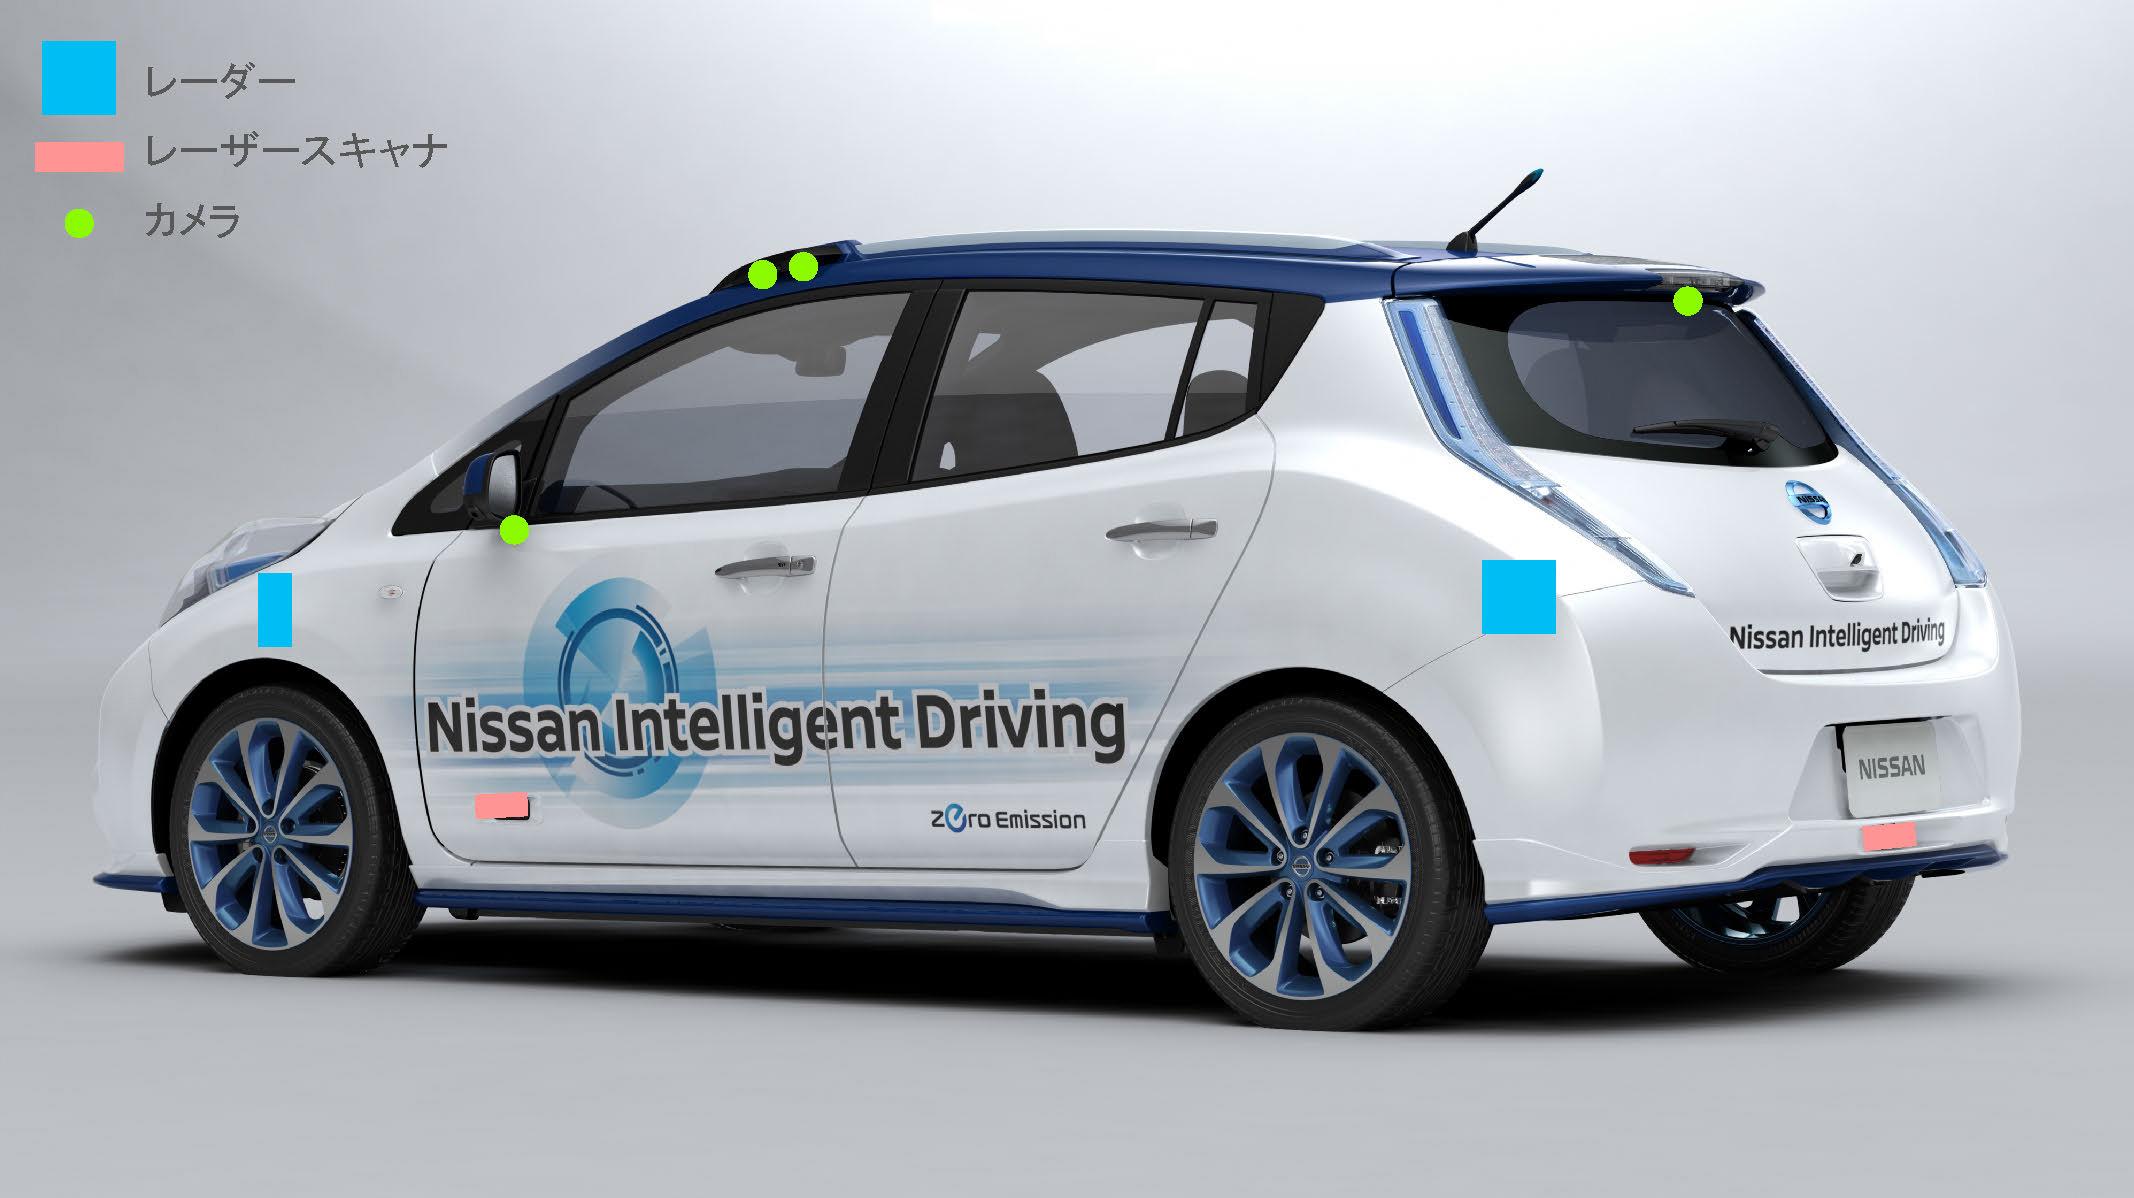 60 Kwh Nissan Leaf >> 2nd gen Leaf expected 2018: 60kWh NMC battery, 300 mile range, autonomous, CFRP